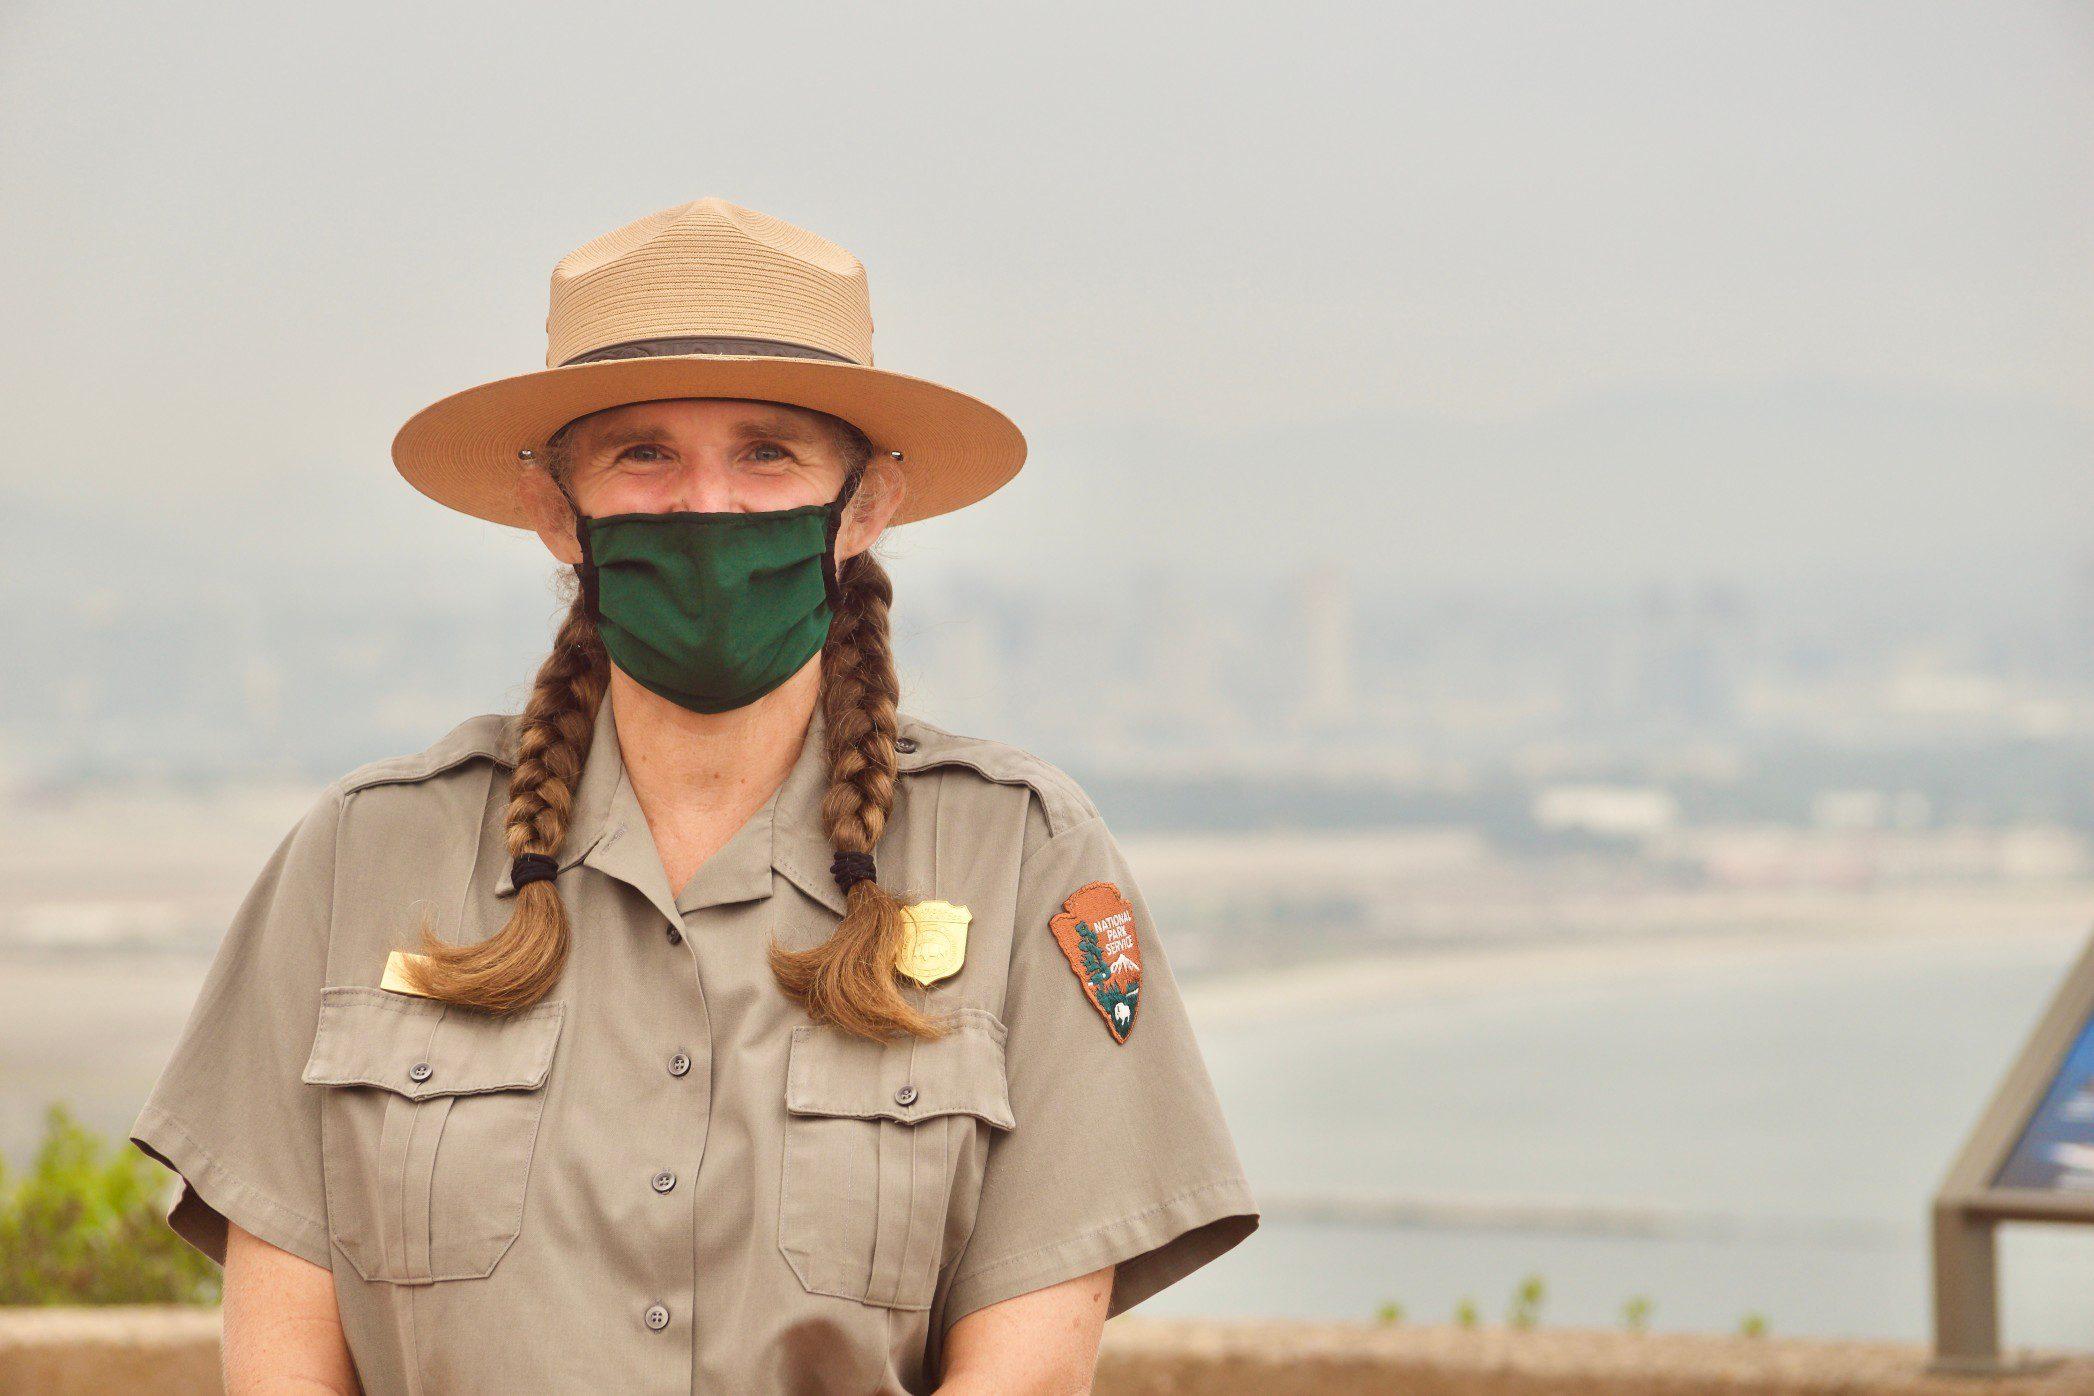 The Best (And Worst) Seasonal National Park Jobs